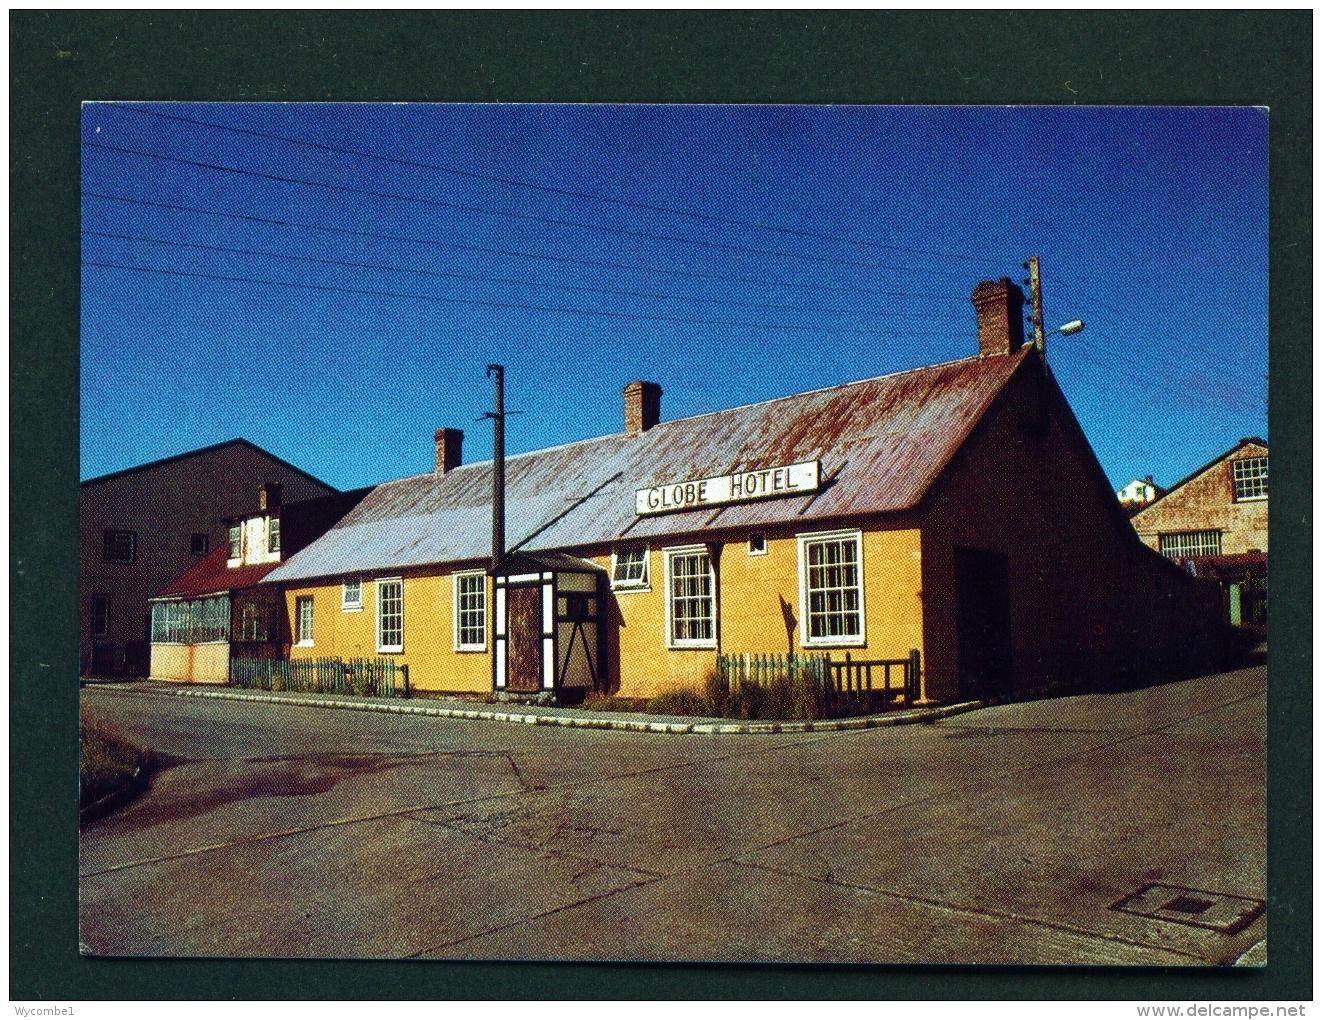 FALKLAND ISLANDS  -  Port Stanley  Globe Hotel  Unused Postcard - Falkland Islands